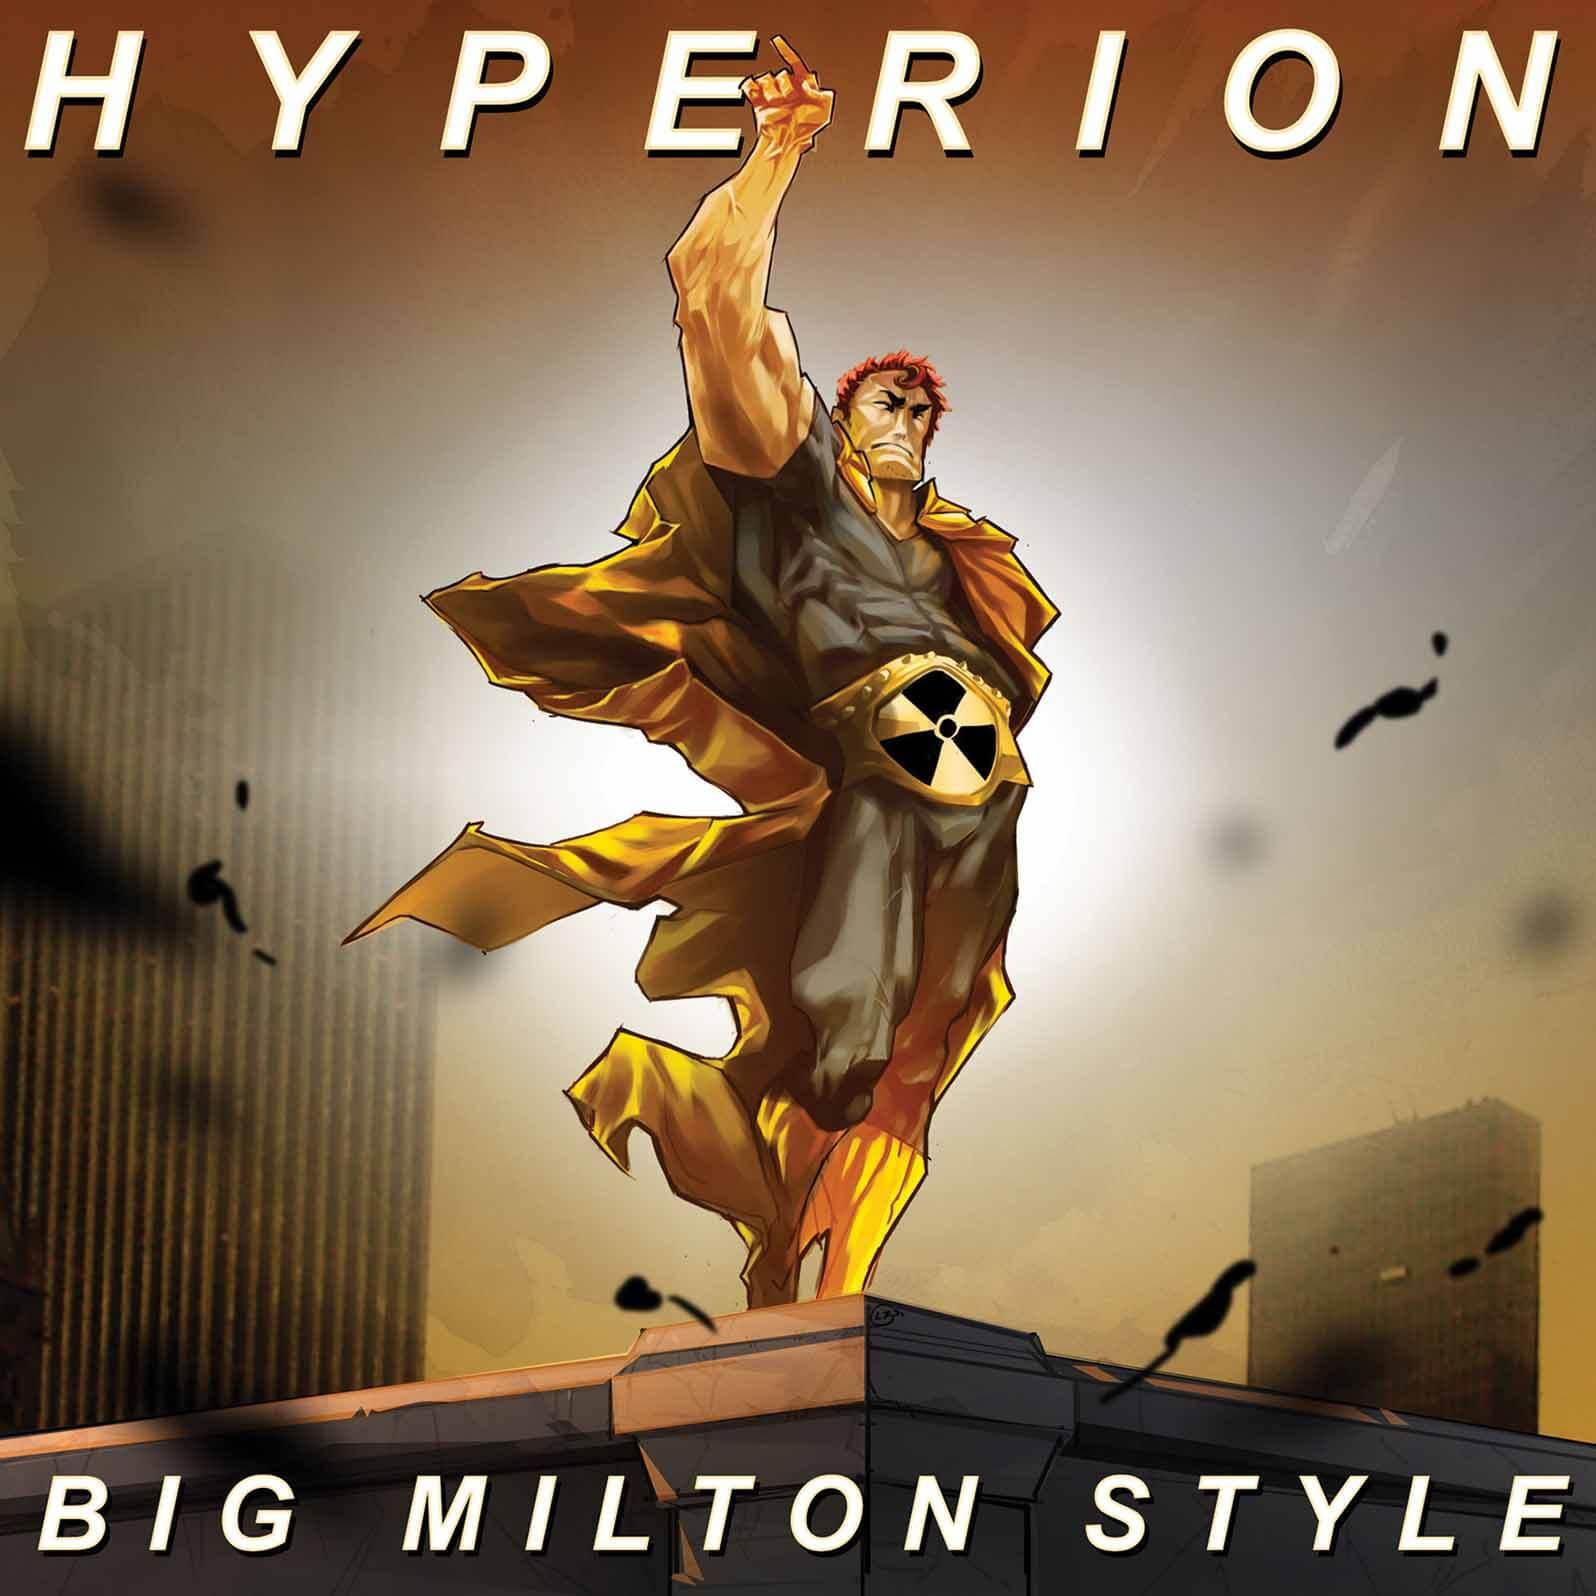 Hyperion_Hip-Hop_Var